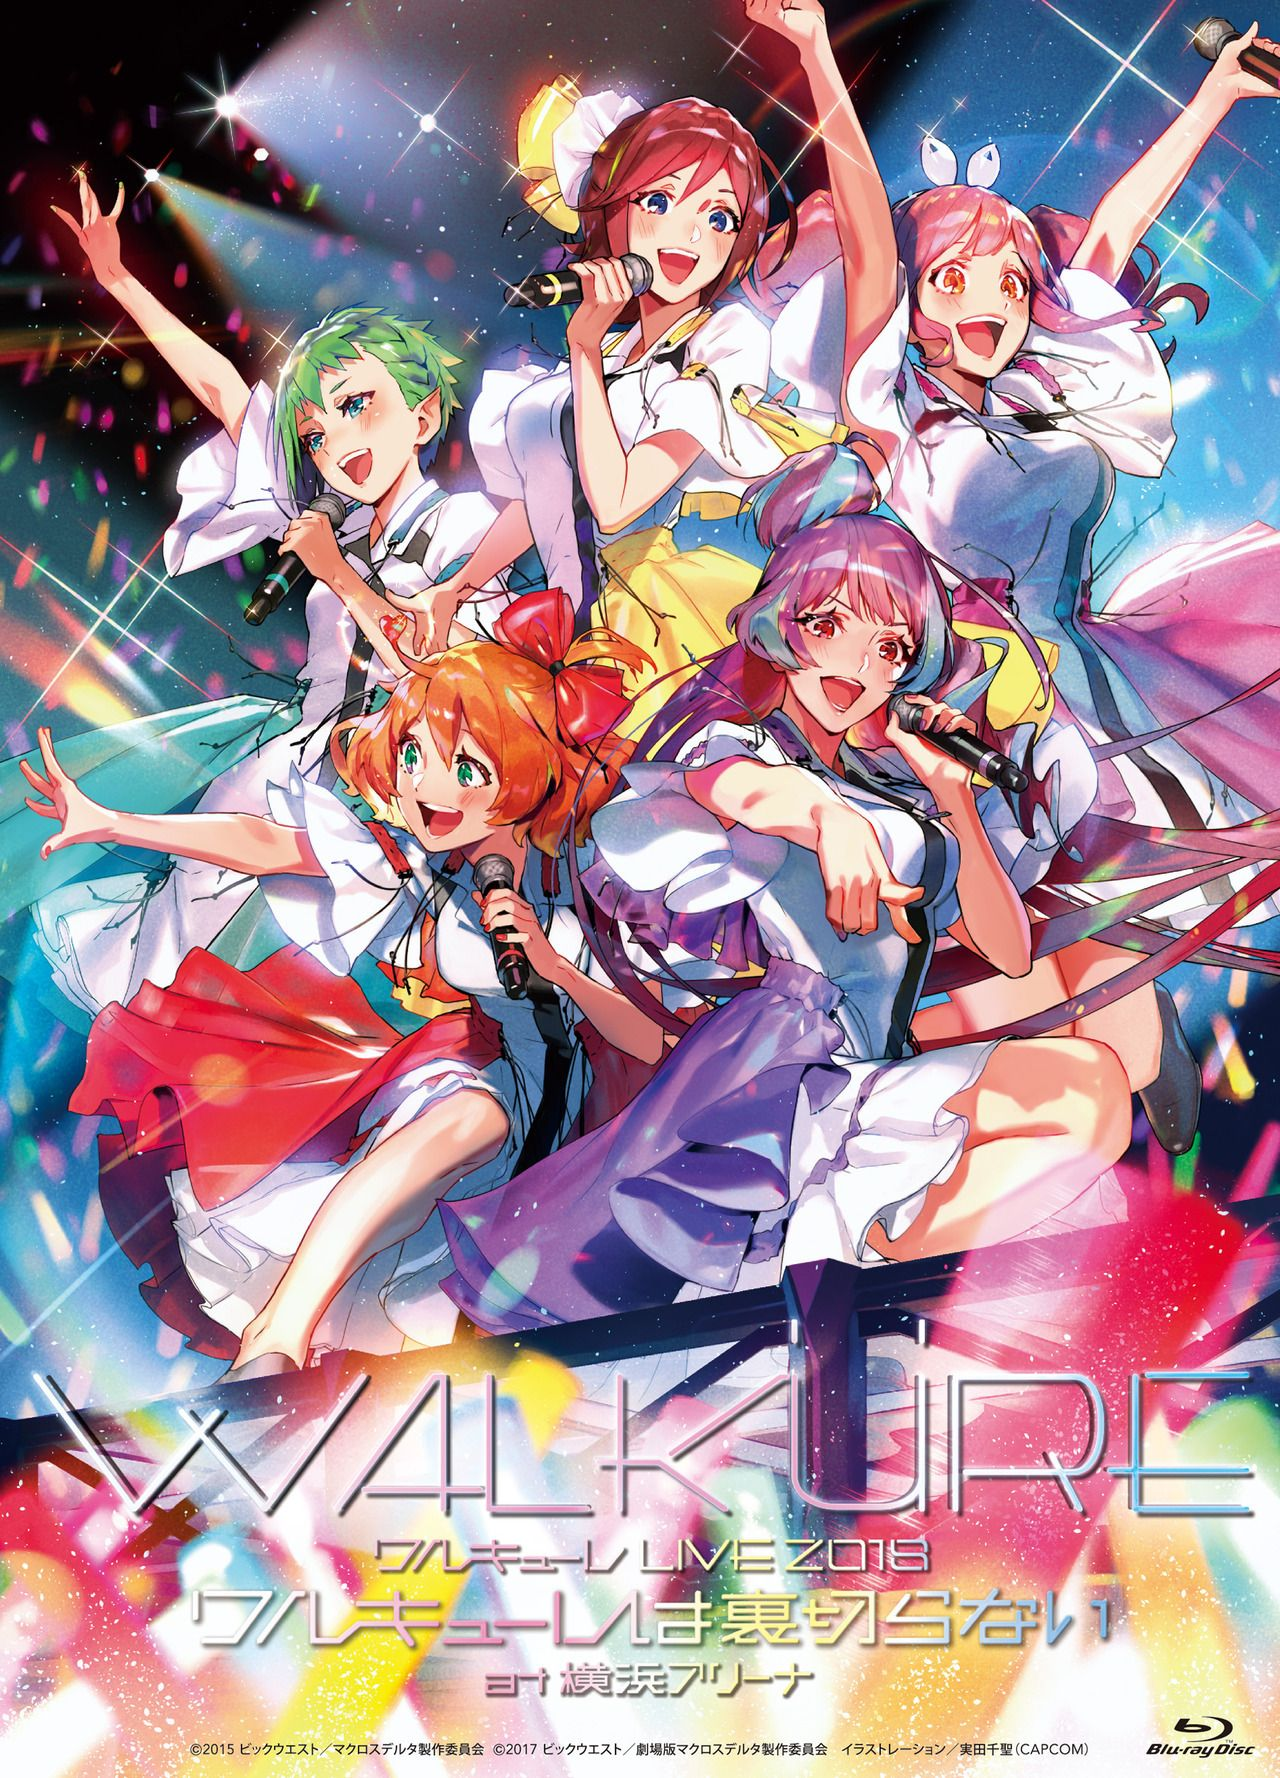 neldorwen Walkure Third Live Blu Ray/DVD cover by Mita